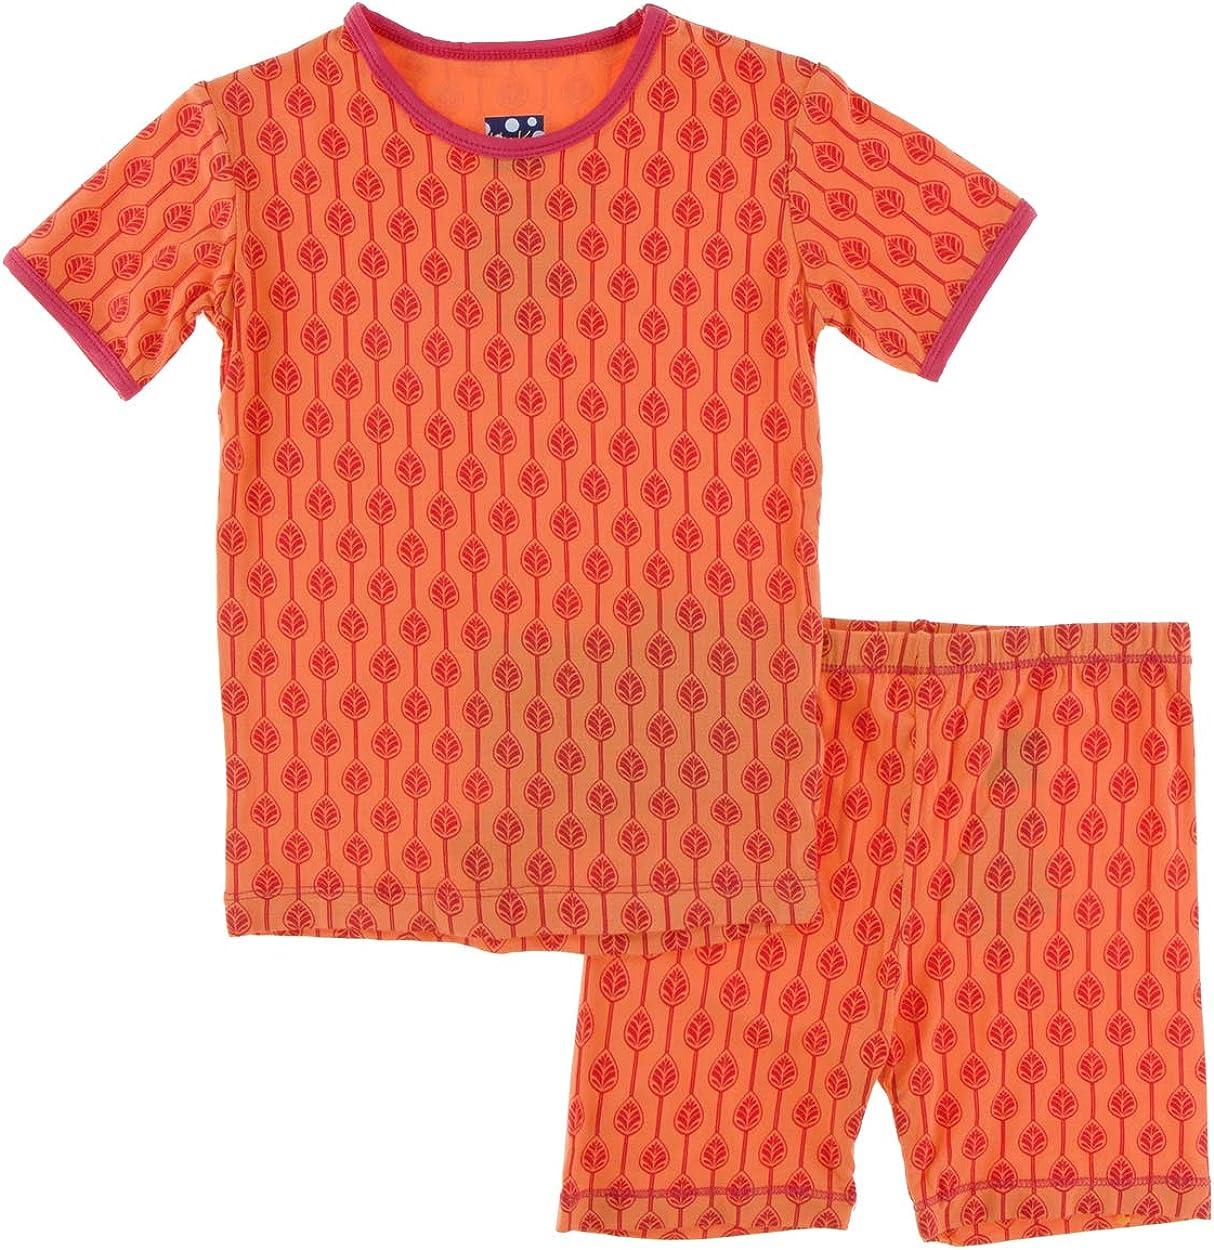 KicKee Pants Print Short Sleeve with Excellent Shorts Pajama Set Max 52% OFF